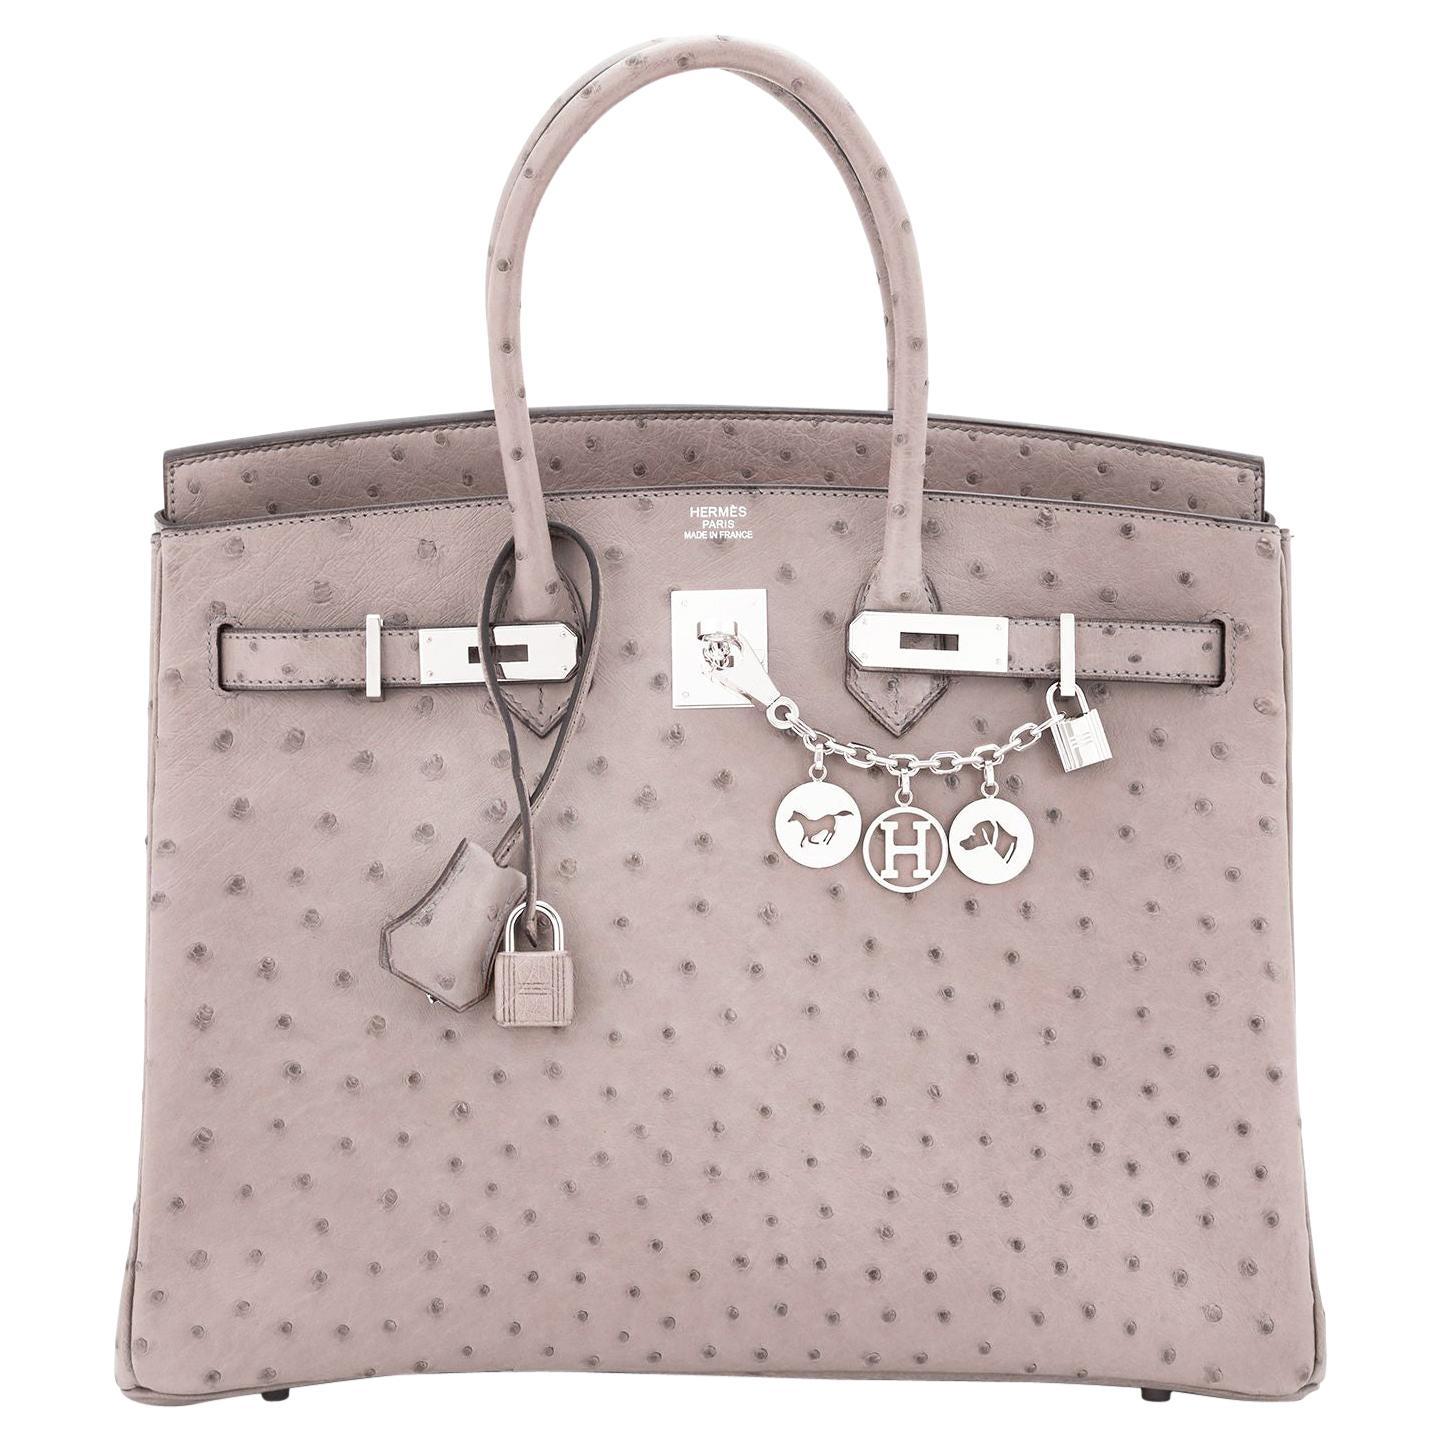 Hermes Birkin 35cm Gris Tourterelle Ostrich Dove Grey Bag NEW ULTRA RARE